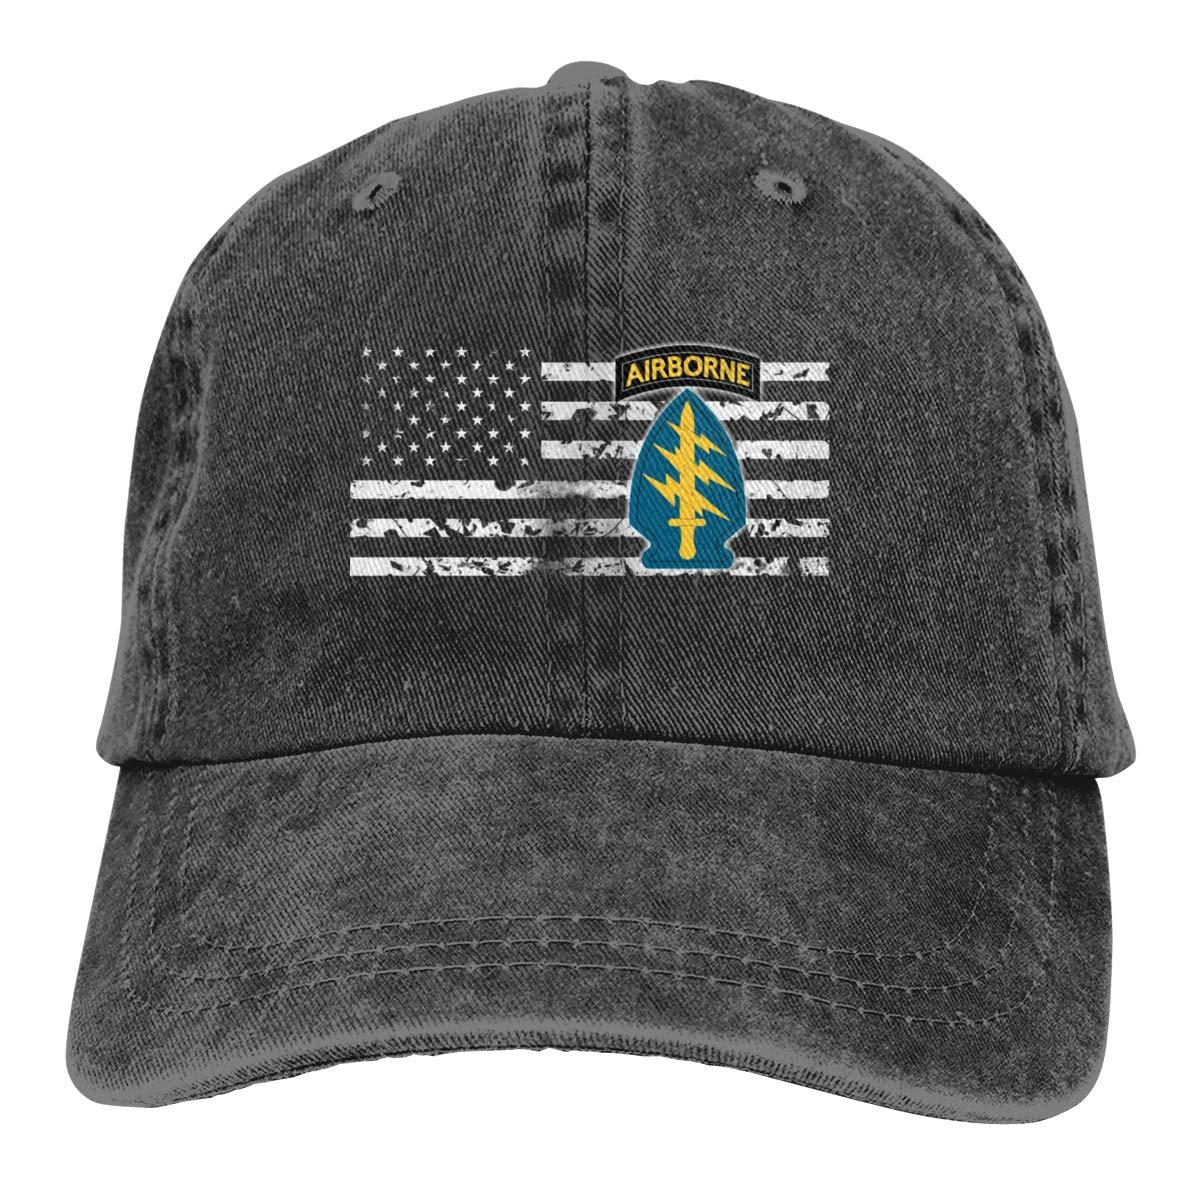 TBVS 77 Men Women Adjustable Denim Jeans Baseball Cap Special Forces Headwear